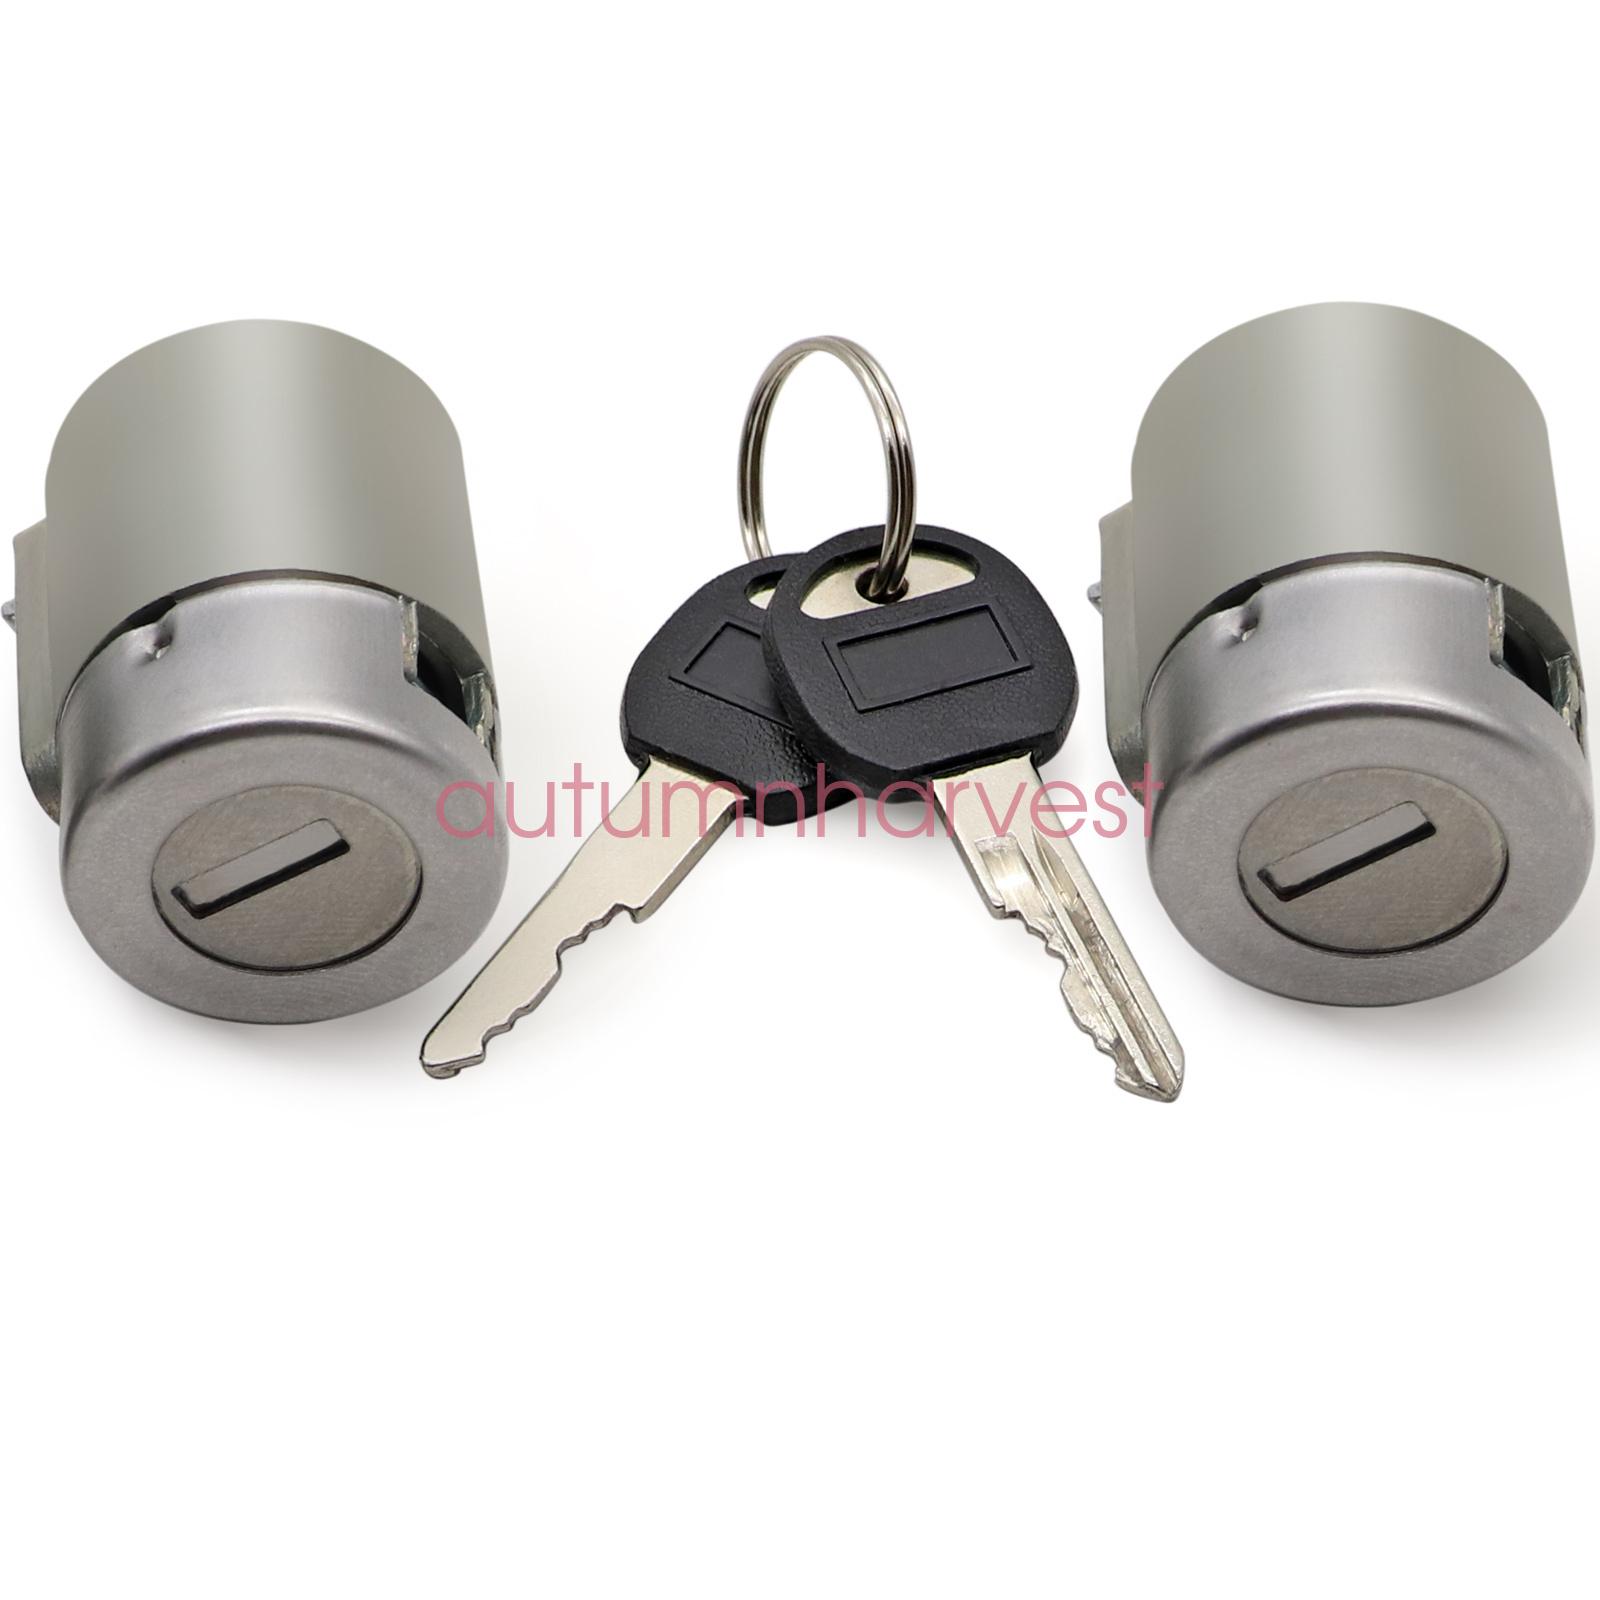 Front Door Lock Cylinder Kit Pair Set With Keys New For C1500 K1500 Tahoe Yukon